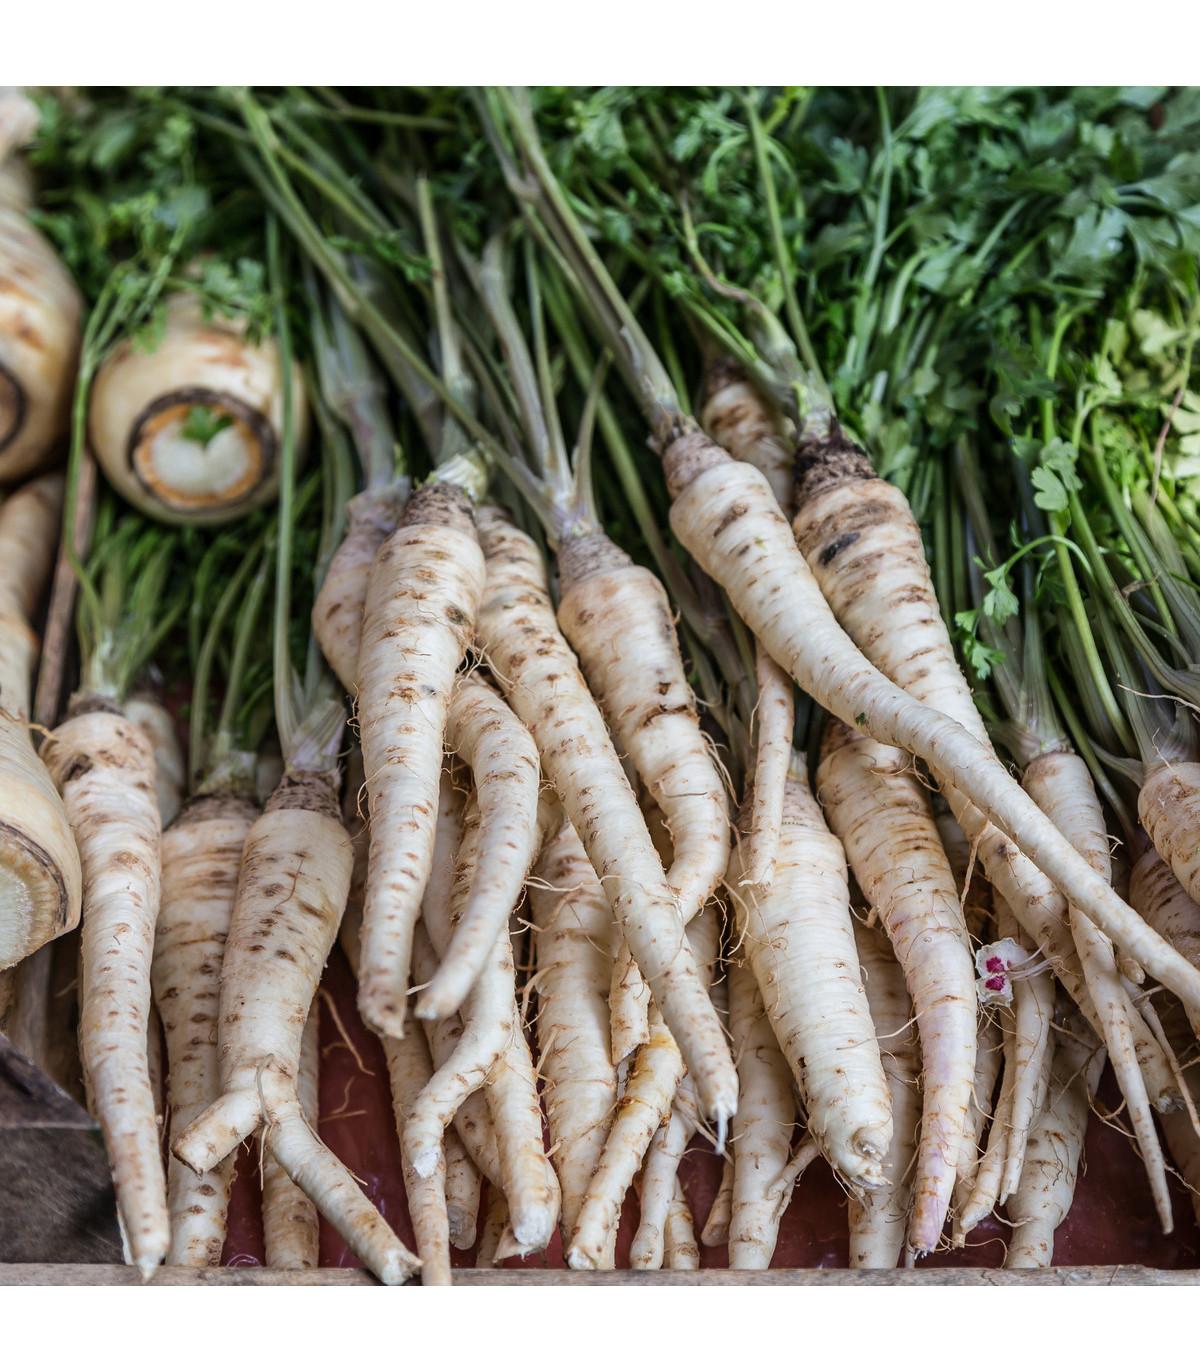 Pastiňák dlouhý bílý Halblange - Pastinaca sativa - osivo pastiňáku - 1 g